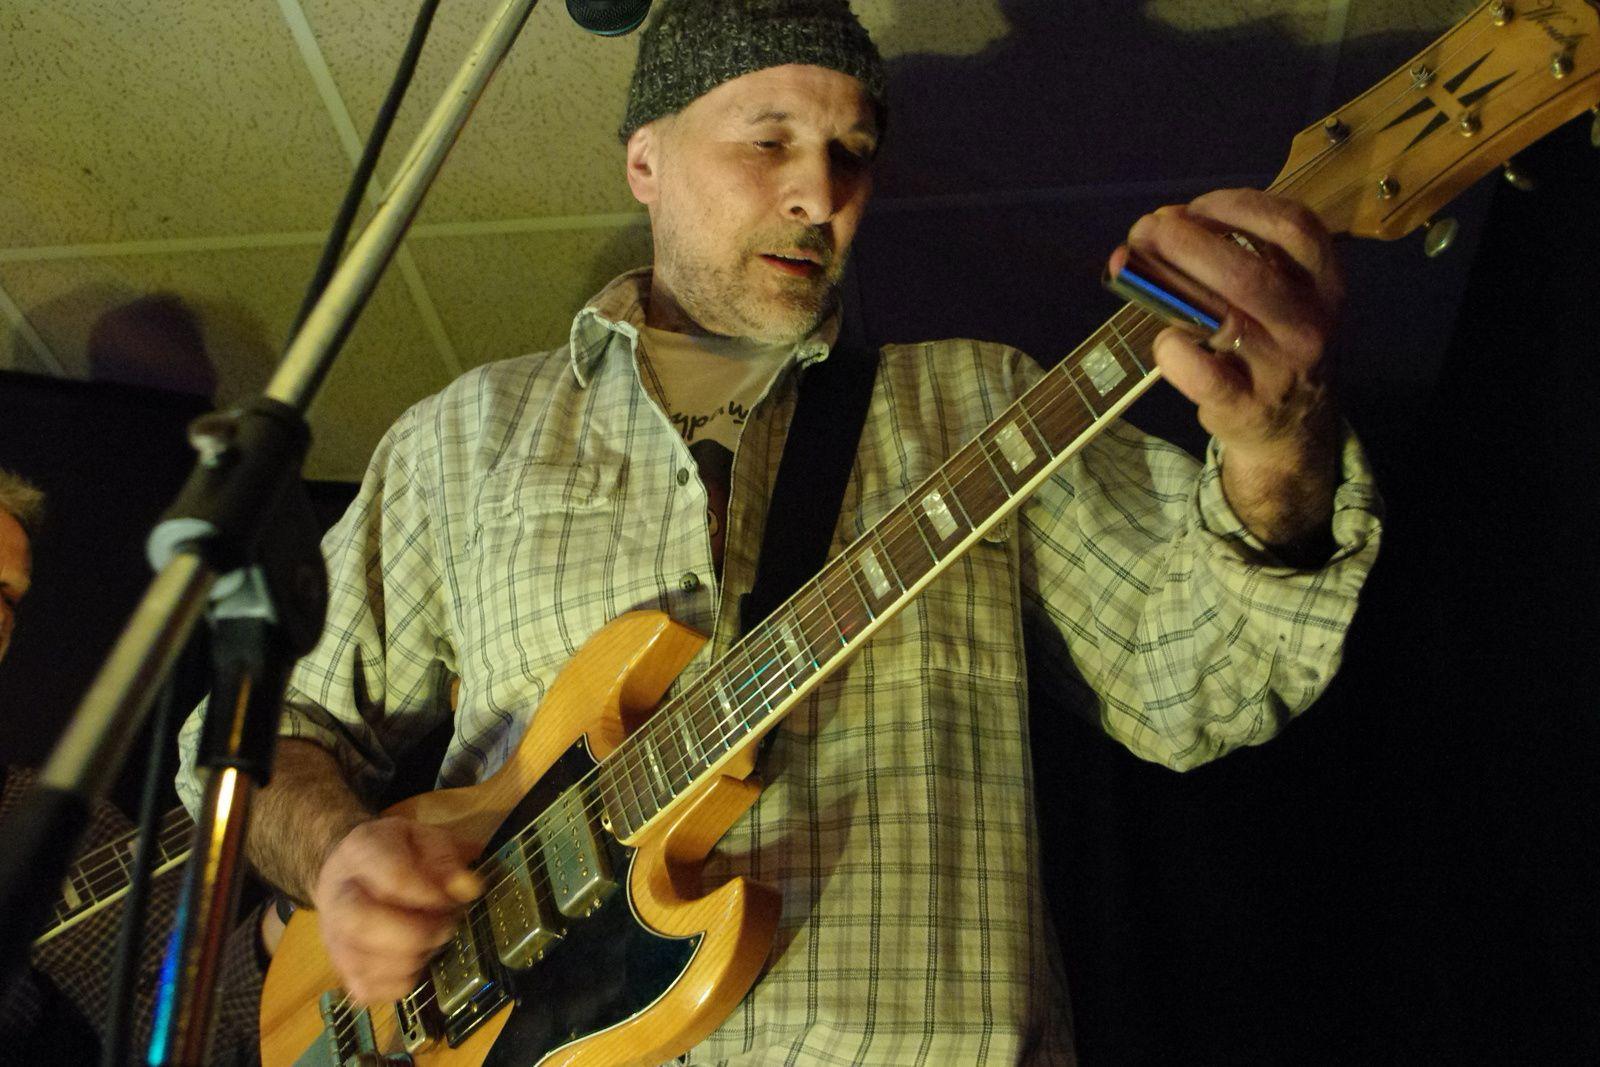 Maxwell Street - 22 novembre 2014 - Steksel Blues, Moorsele (B)